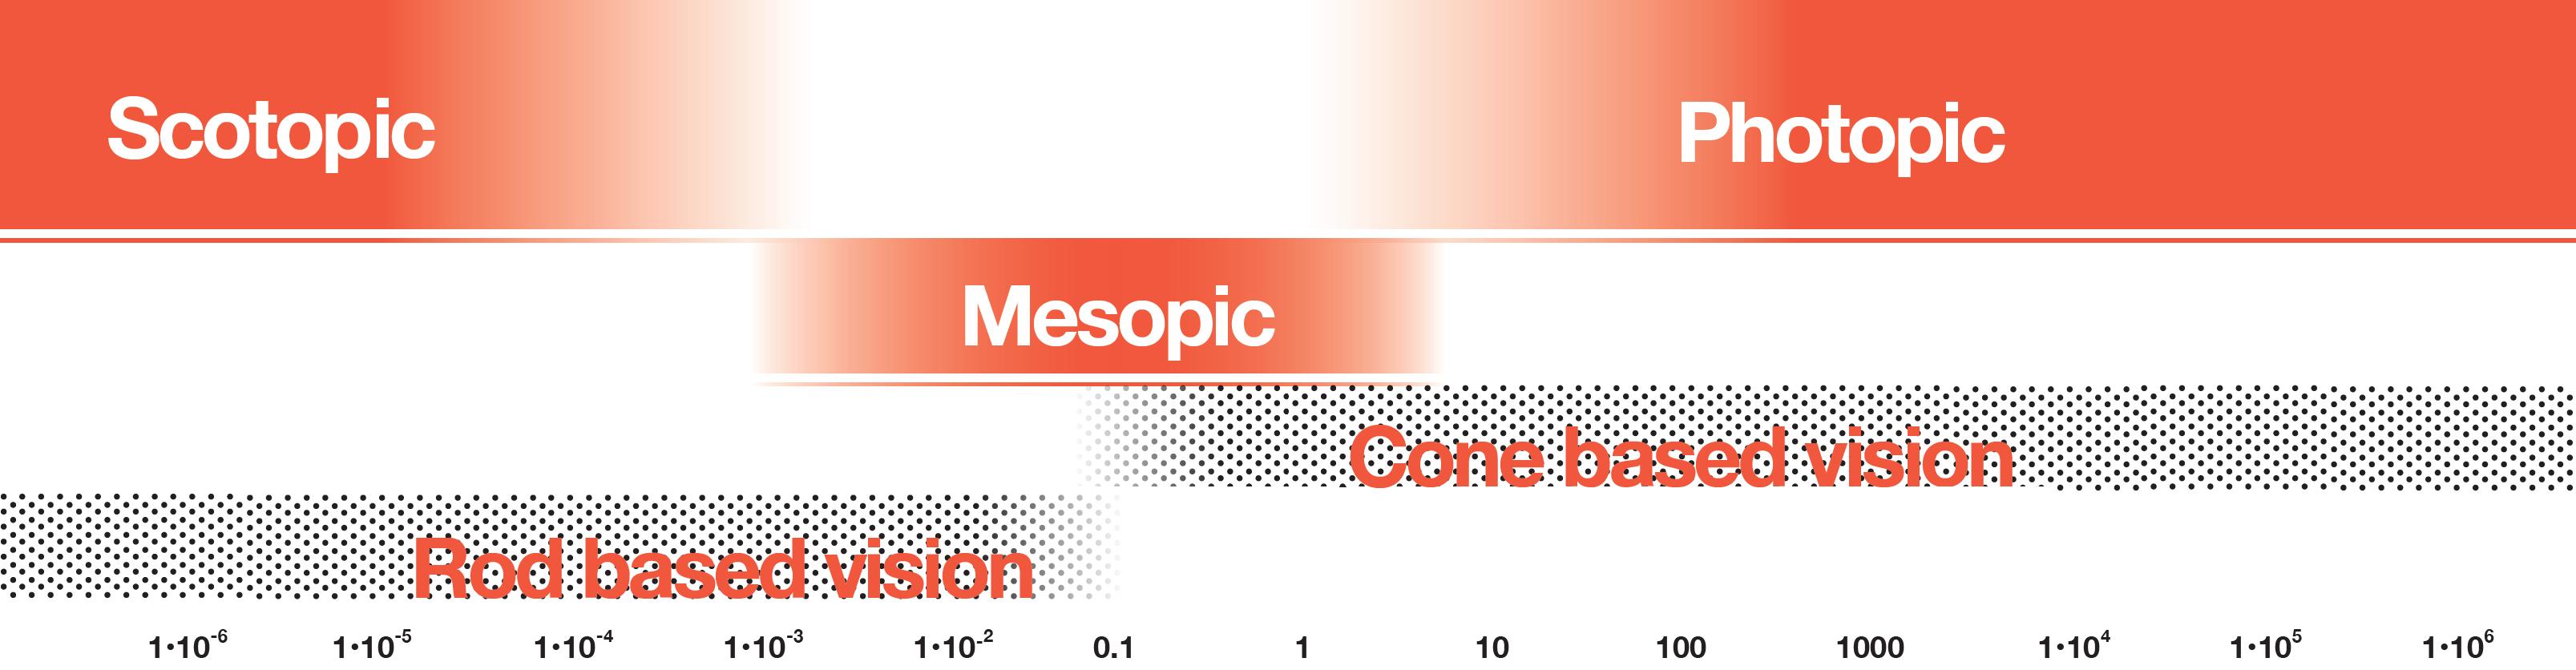 Human eye luminance level range and types of vision: cd/m2